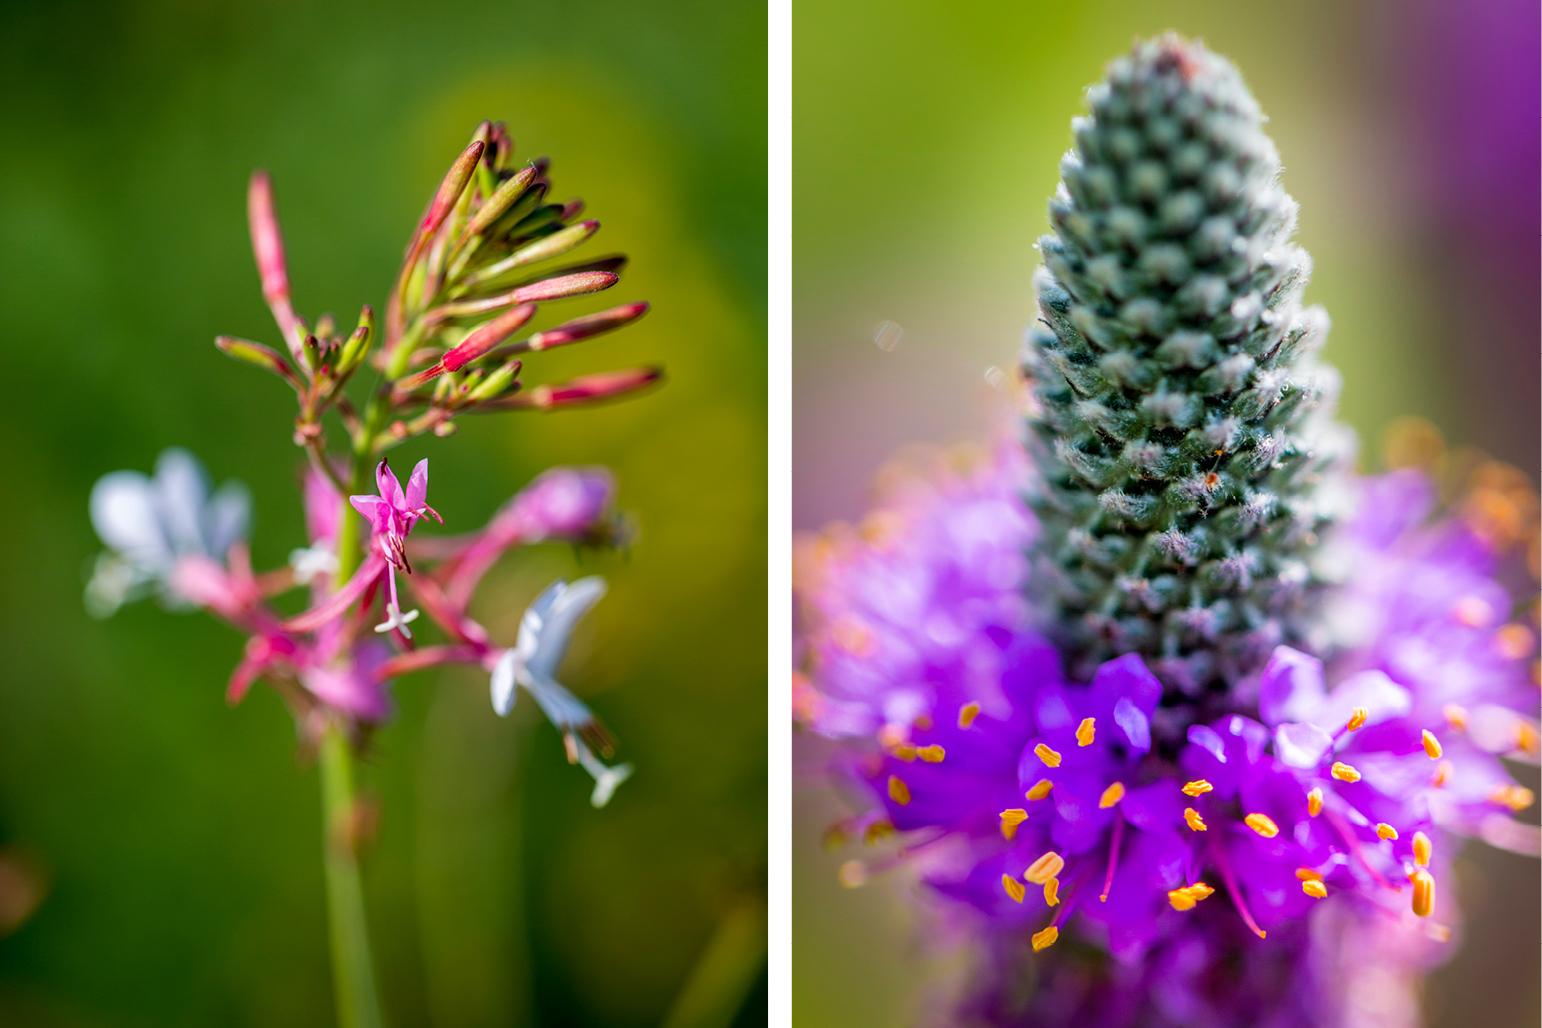 CERA plantlife in the summer